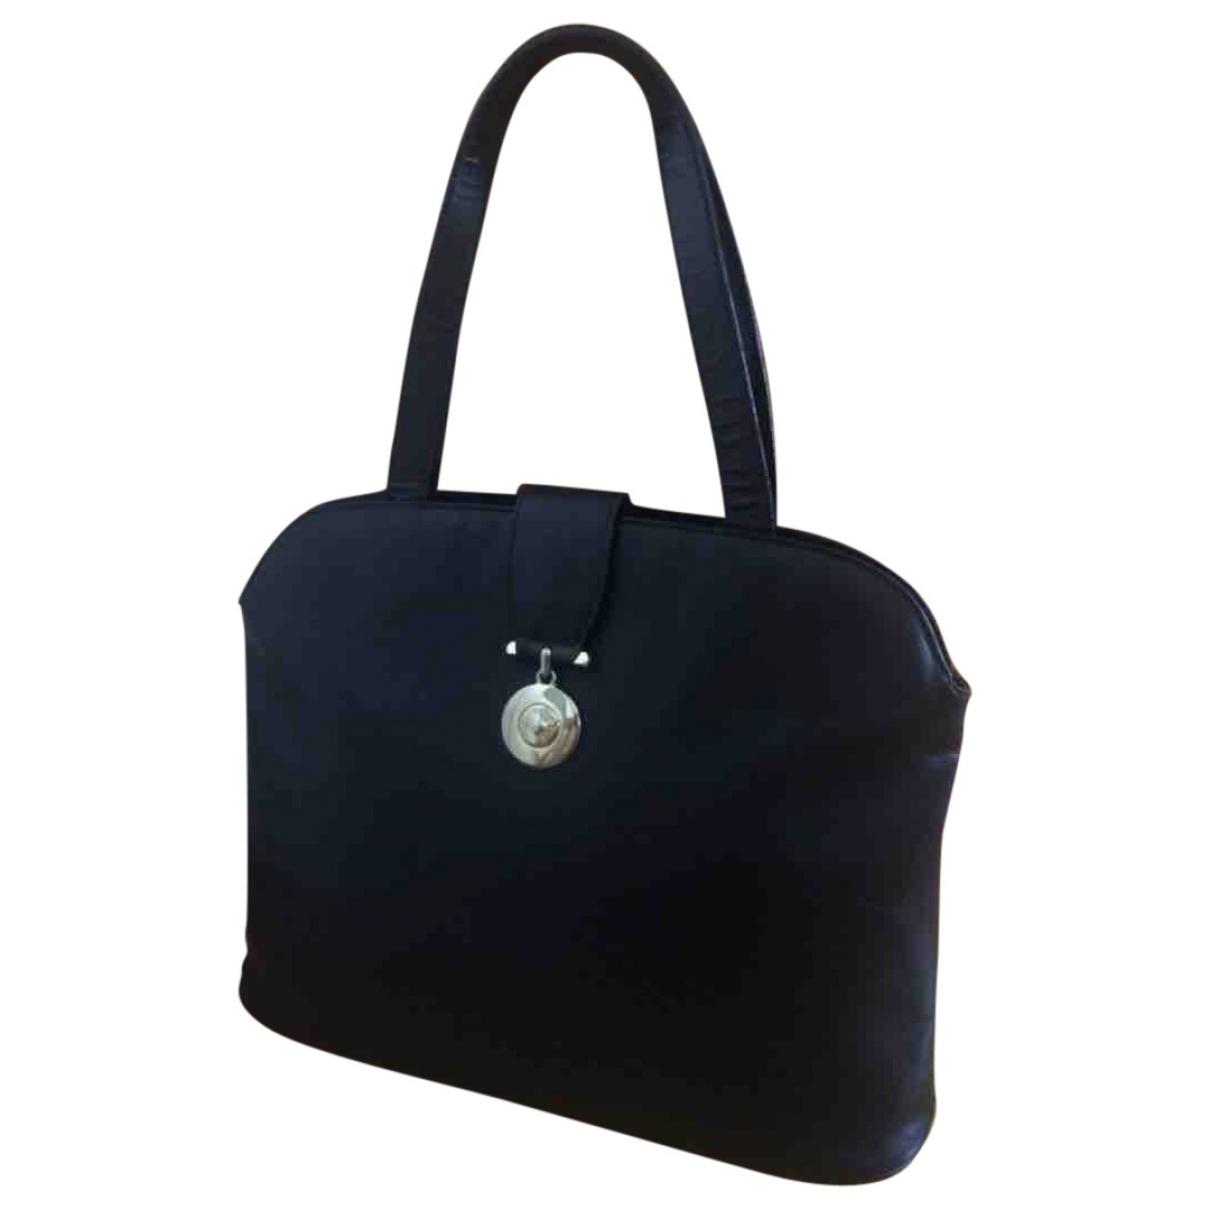 Givenchy \N Black Leather handbag for Women \N